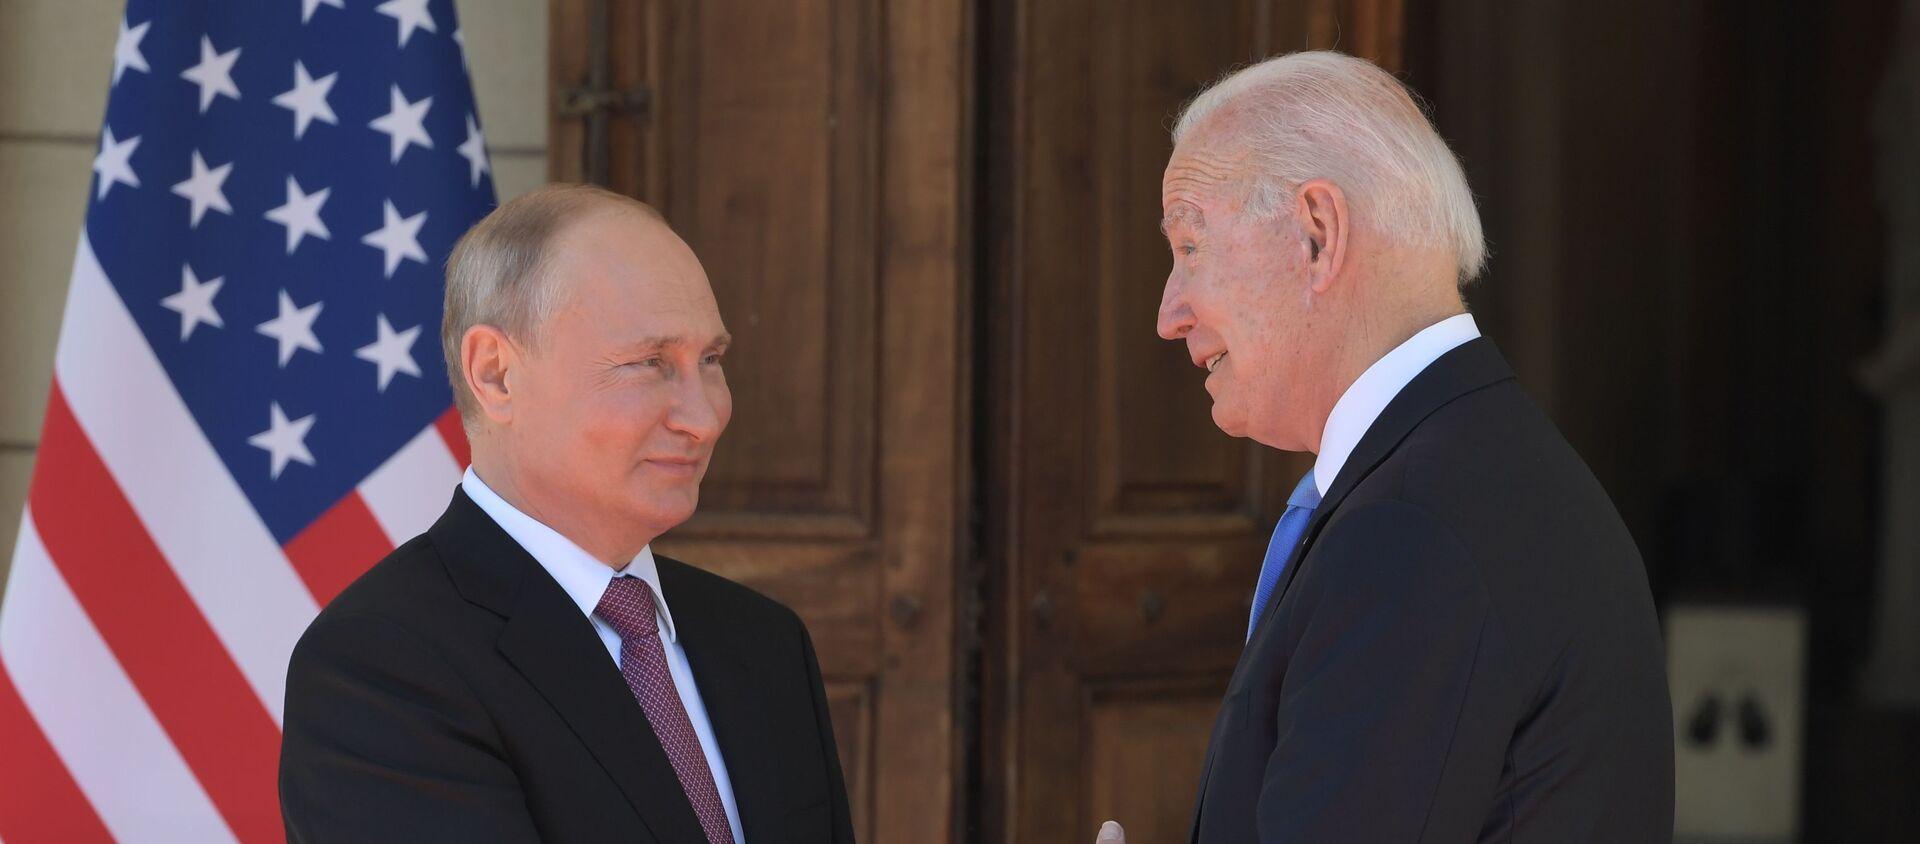 Putin gặp Biden ở Geneva - Sputnik Việt Nam, 1920, 17.06.2021